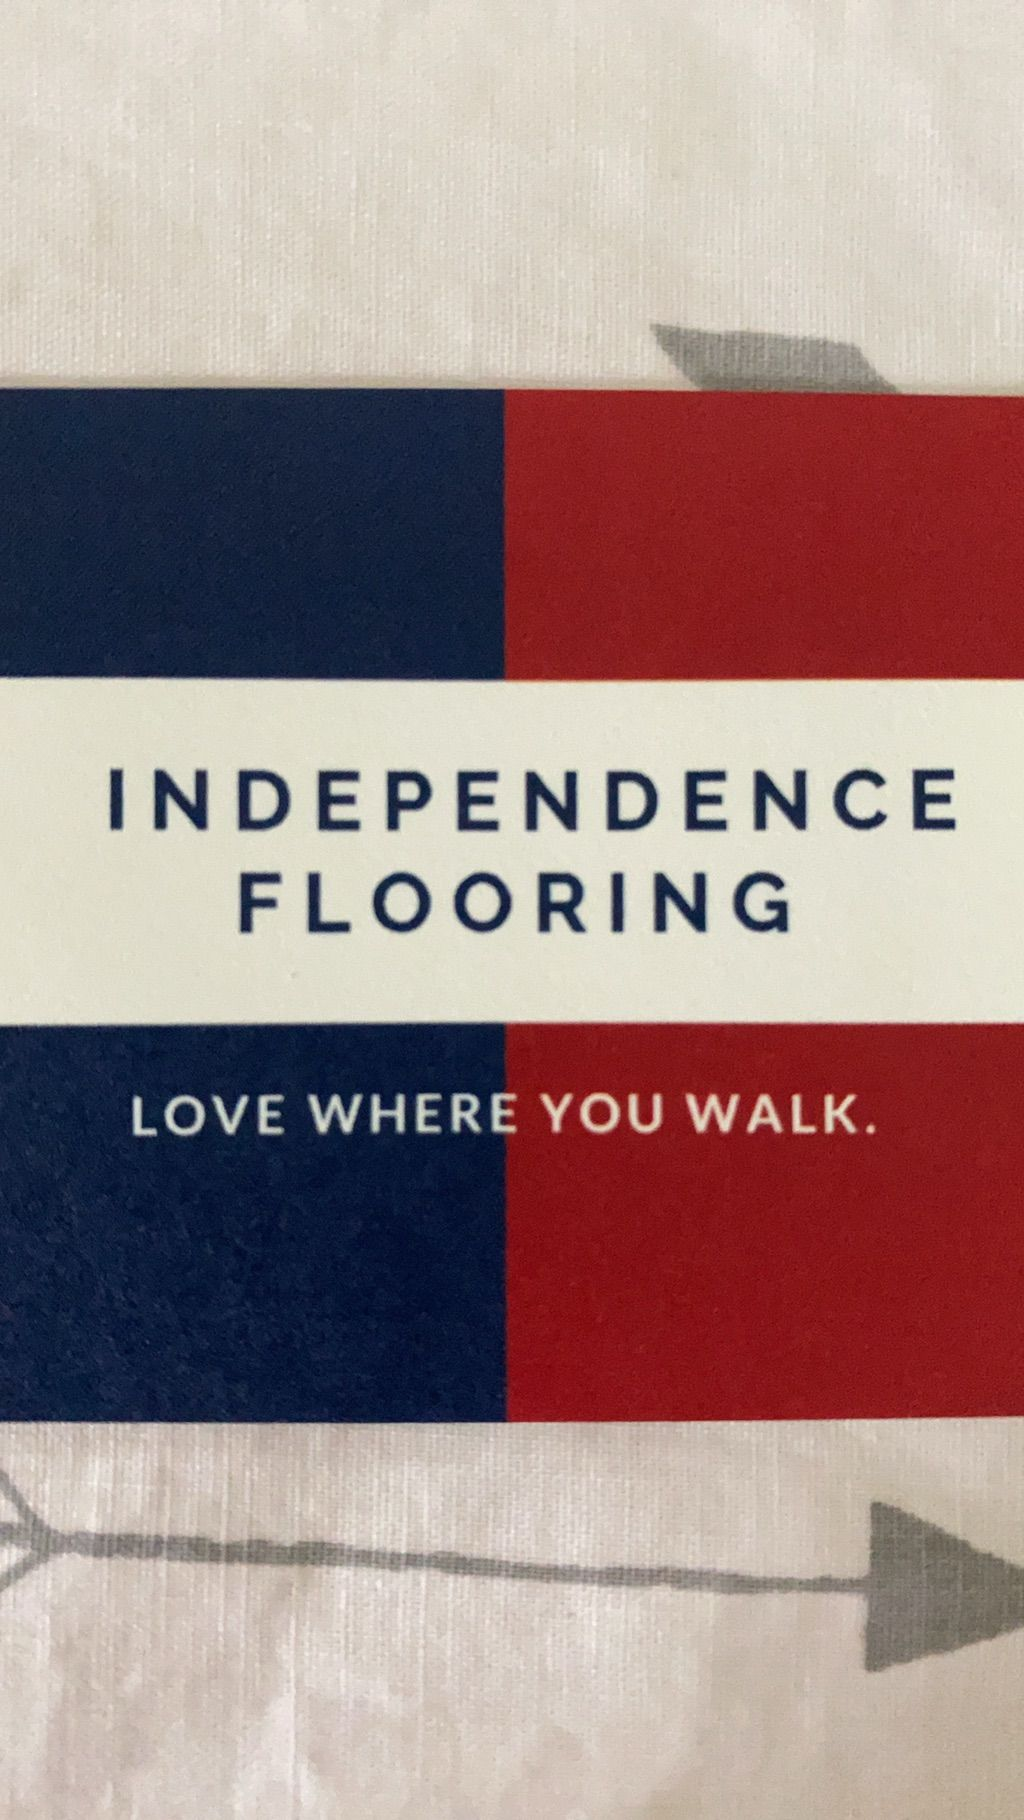 Independence Flooring